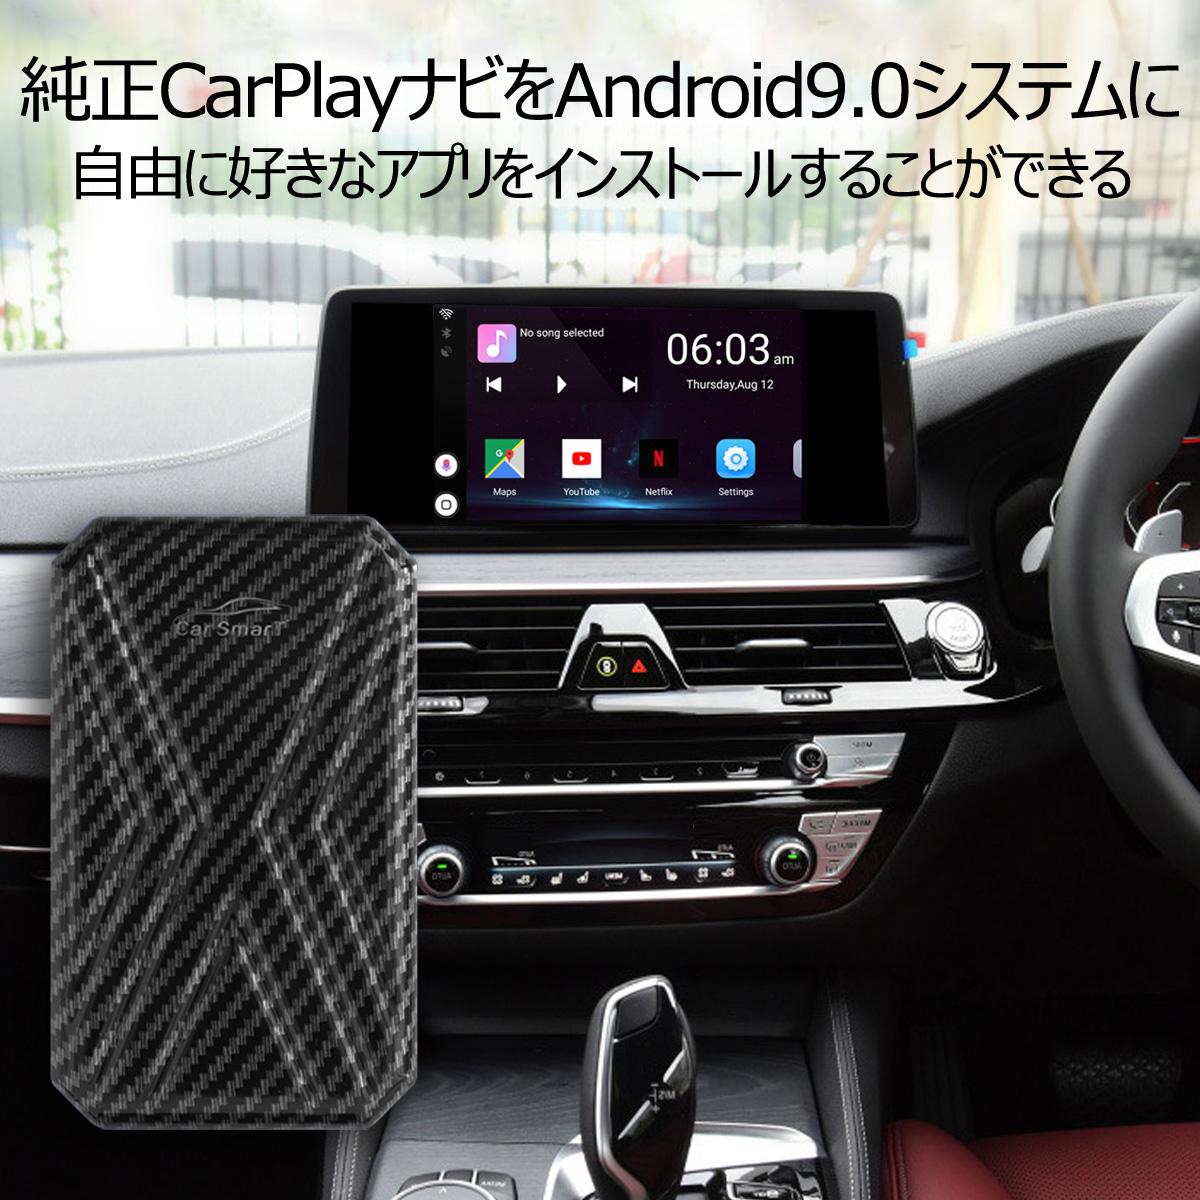 CarPlay AI BOX Android GPS付 CarPlayナビをAndroidシステムに Google PlayストアからYouTubeやNetflixなどを自由にインストール 楽しめる 画面2分割表示可能 Googleマップ 音楽 Siri 通話 対応 4G + 64G 純正有線カープレイ搭載車専用 宅配便送料無料 1ヶ月保証